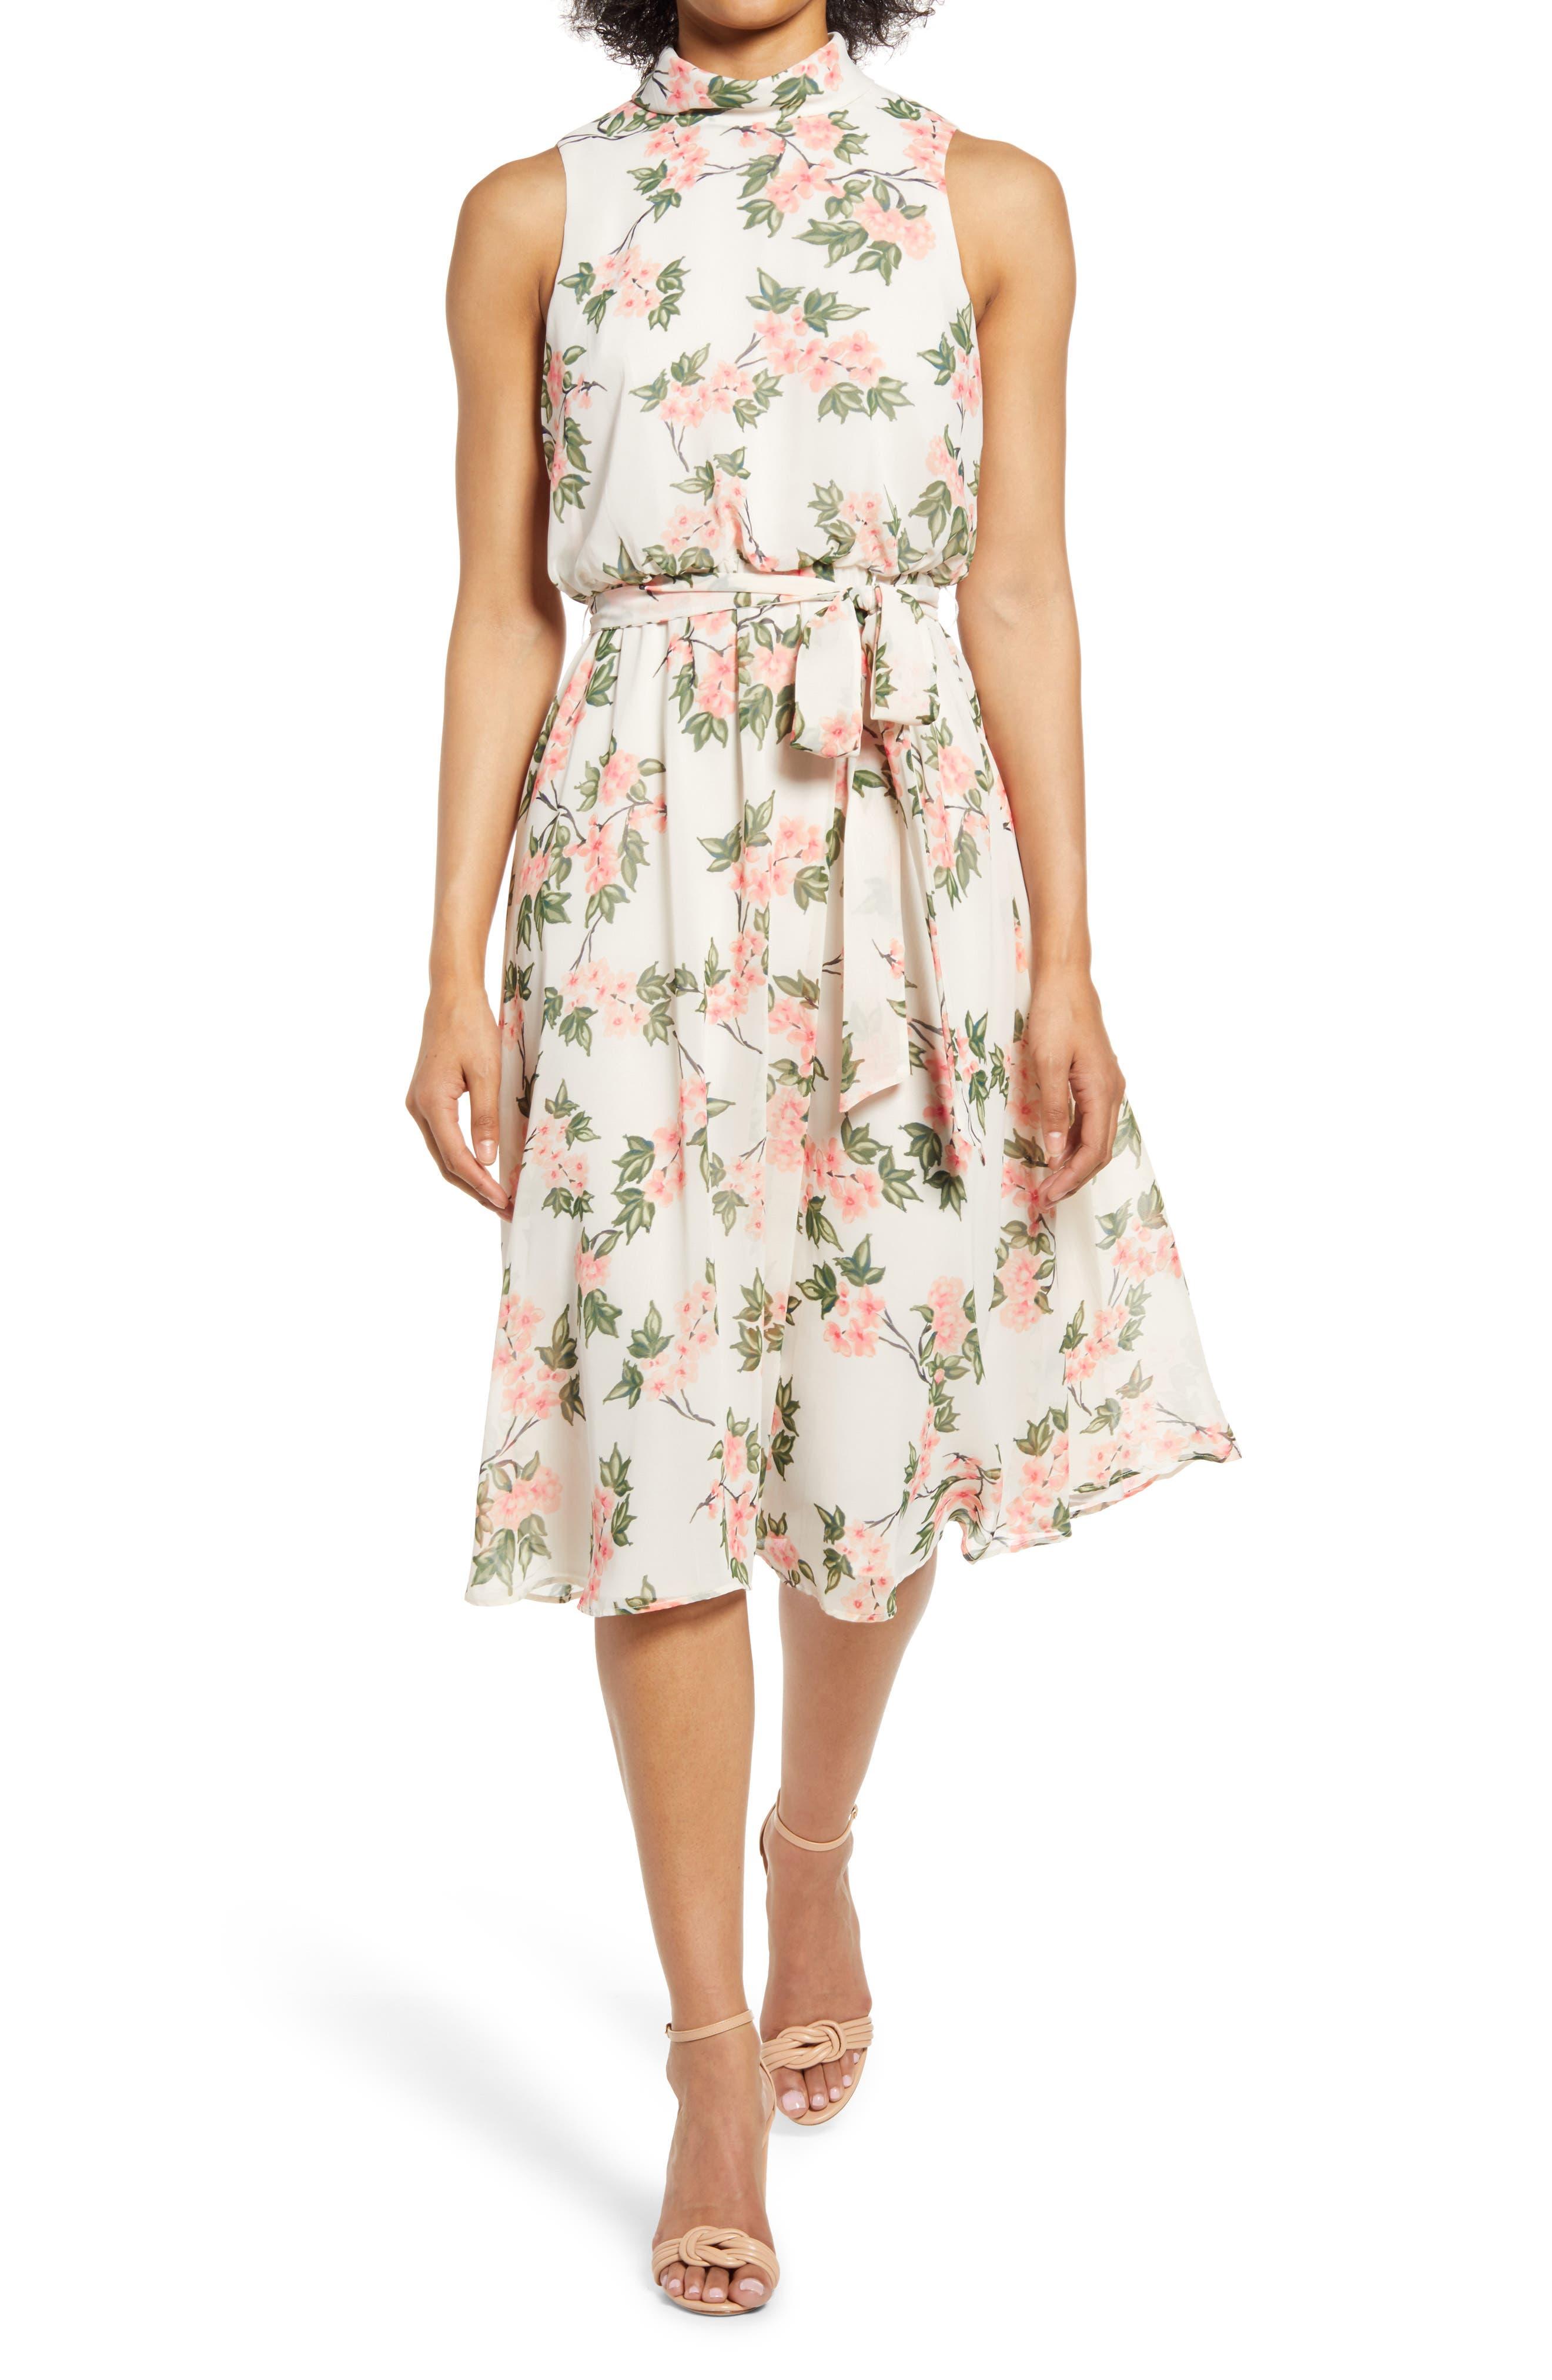 Floral Sleeveless Midi Dress